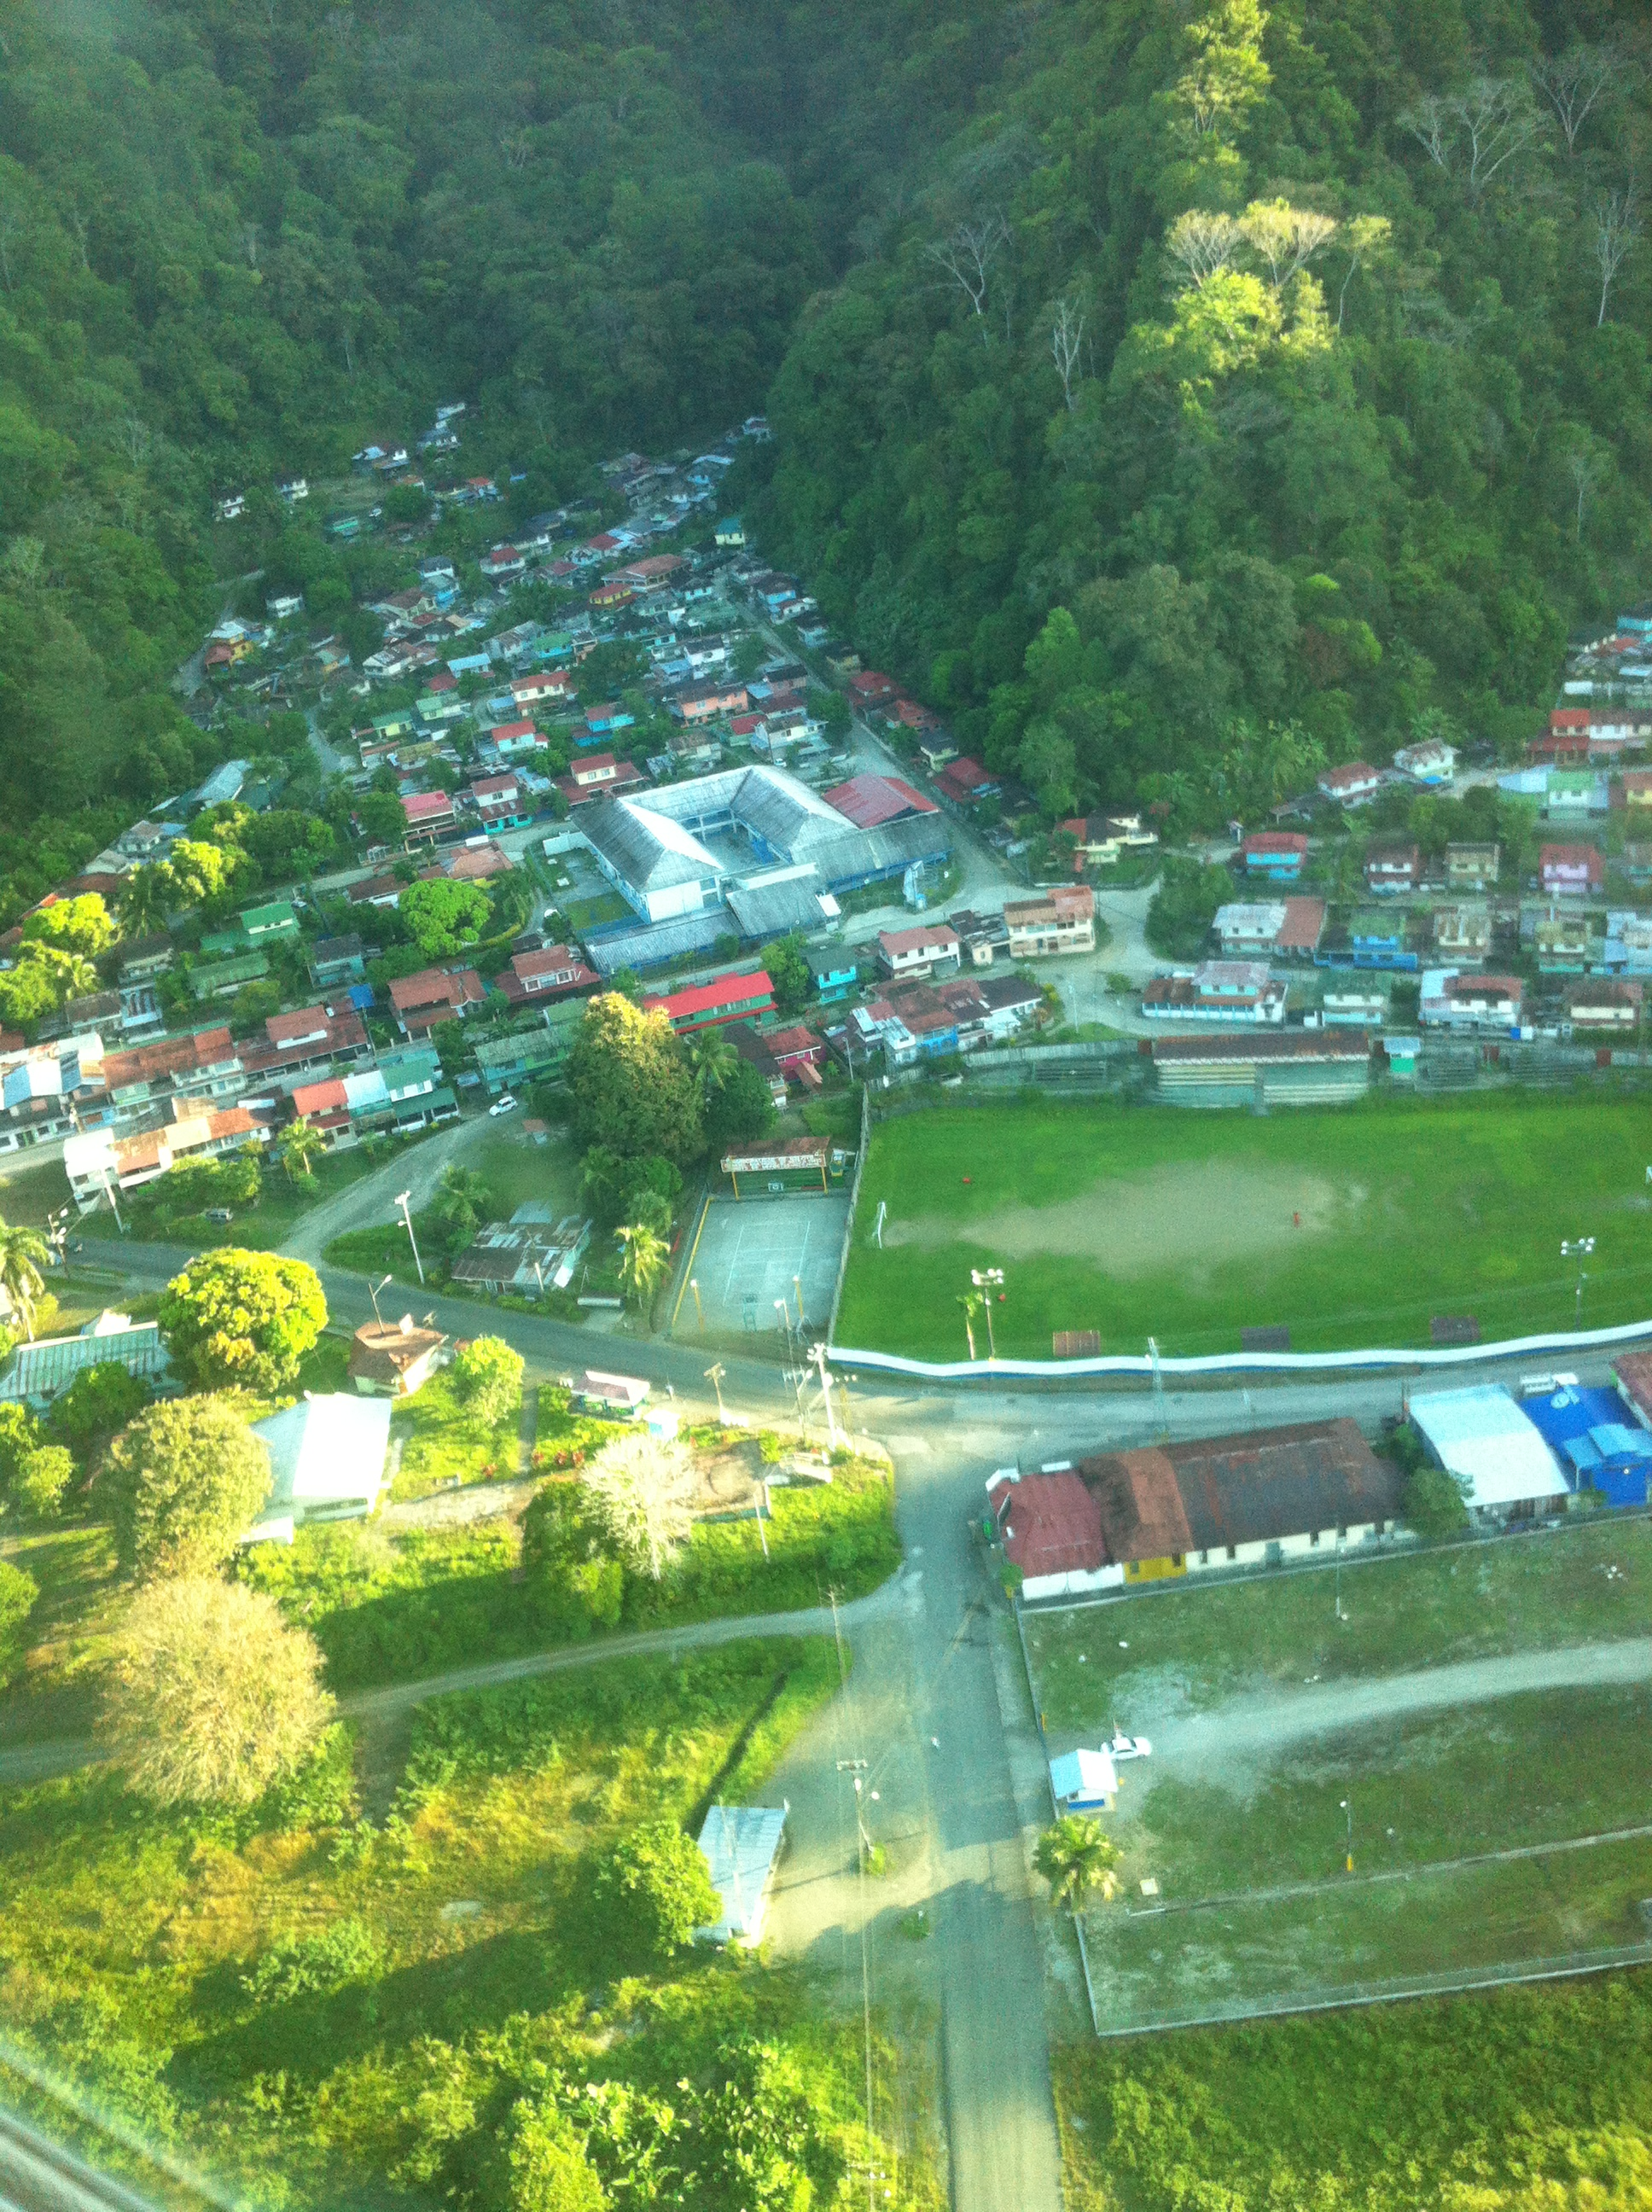 Hotels in Golfito Costa Rica